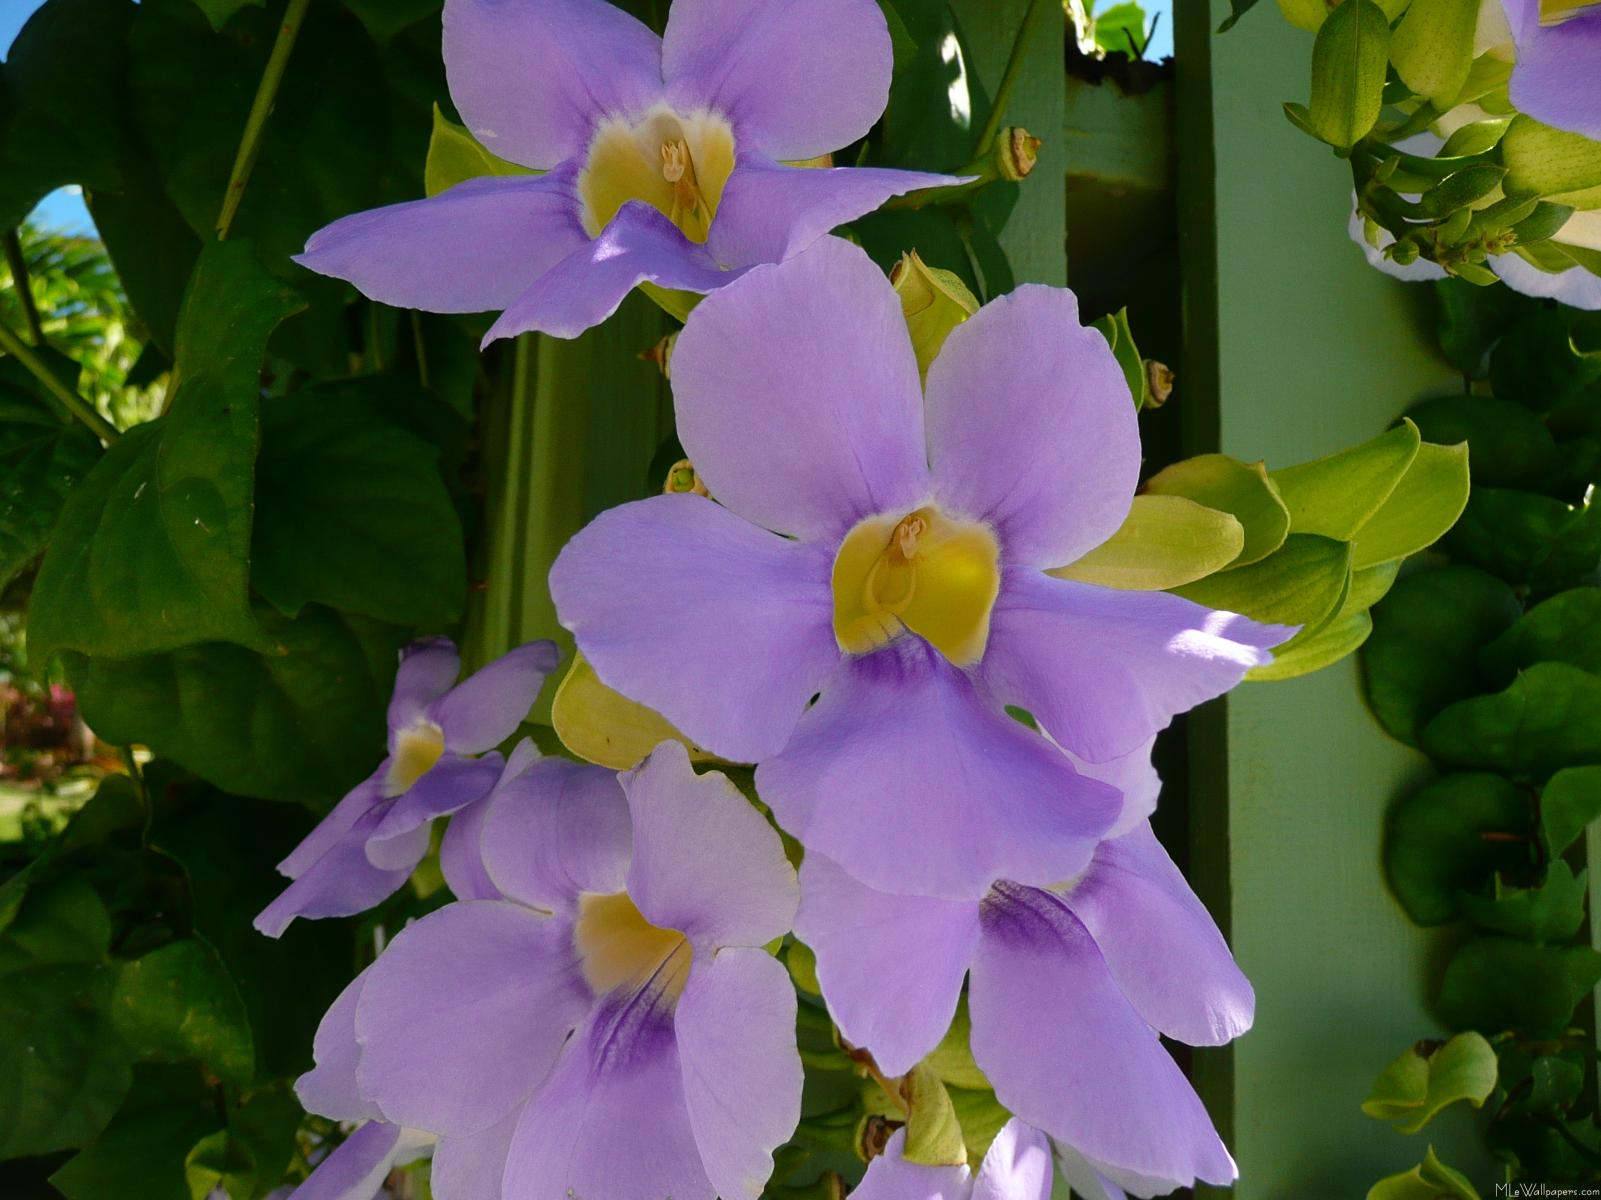 Mlewallpapers Com Sky Flower Vine